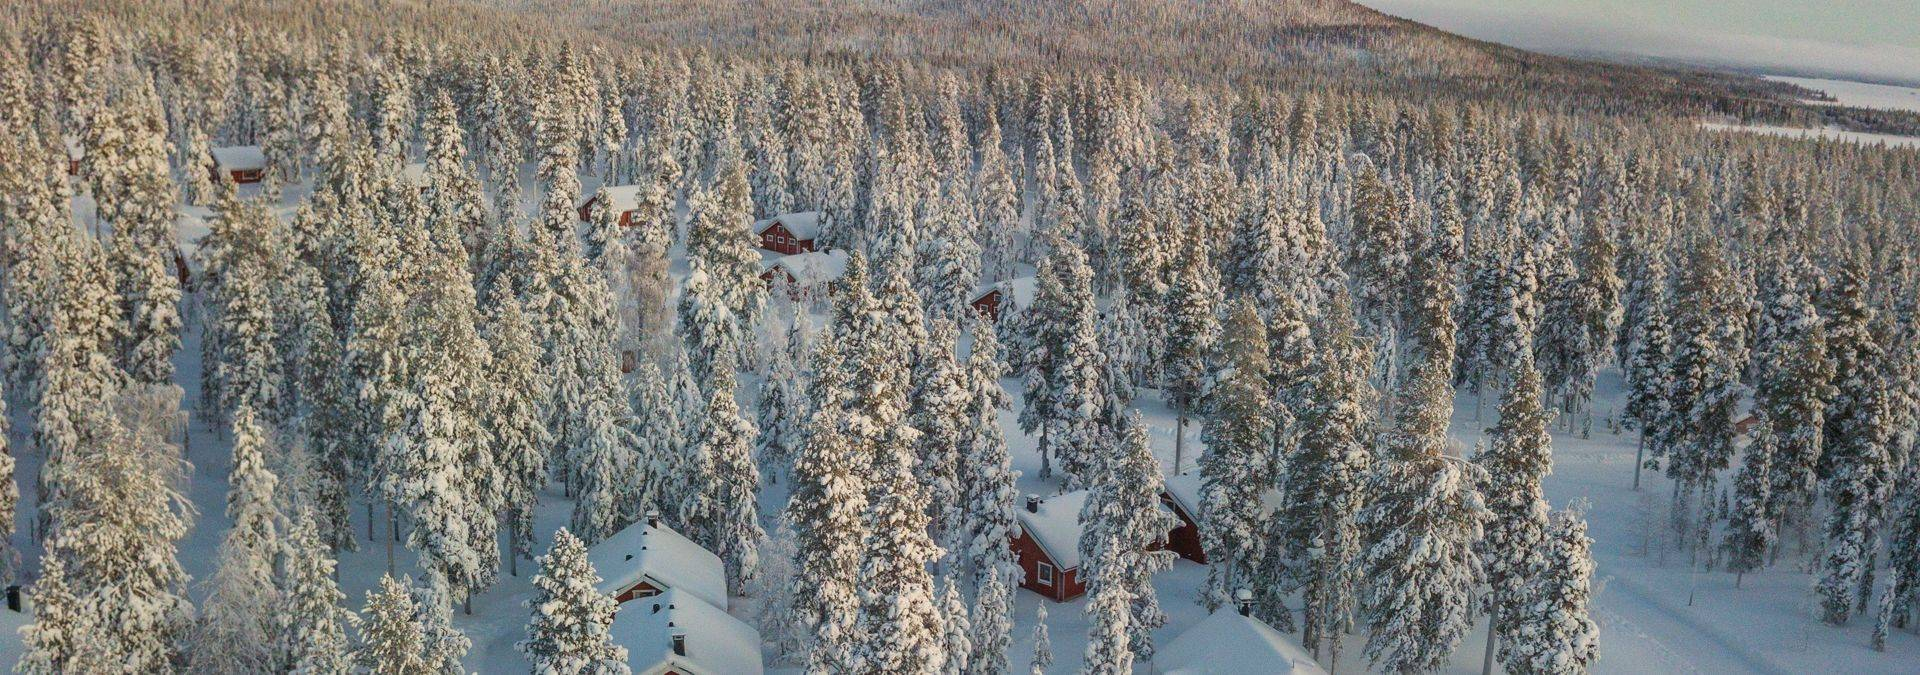 Hotel Jeris Aerial Print 7   Antti Pietikainen